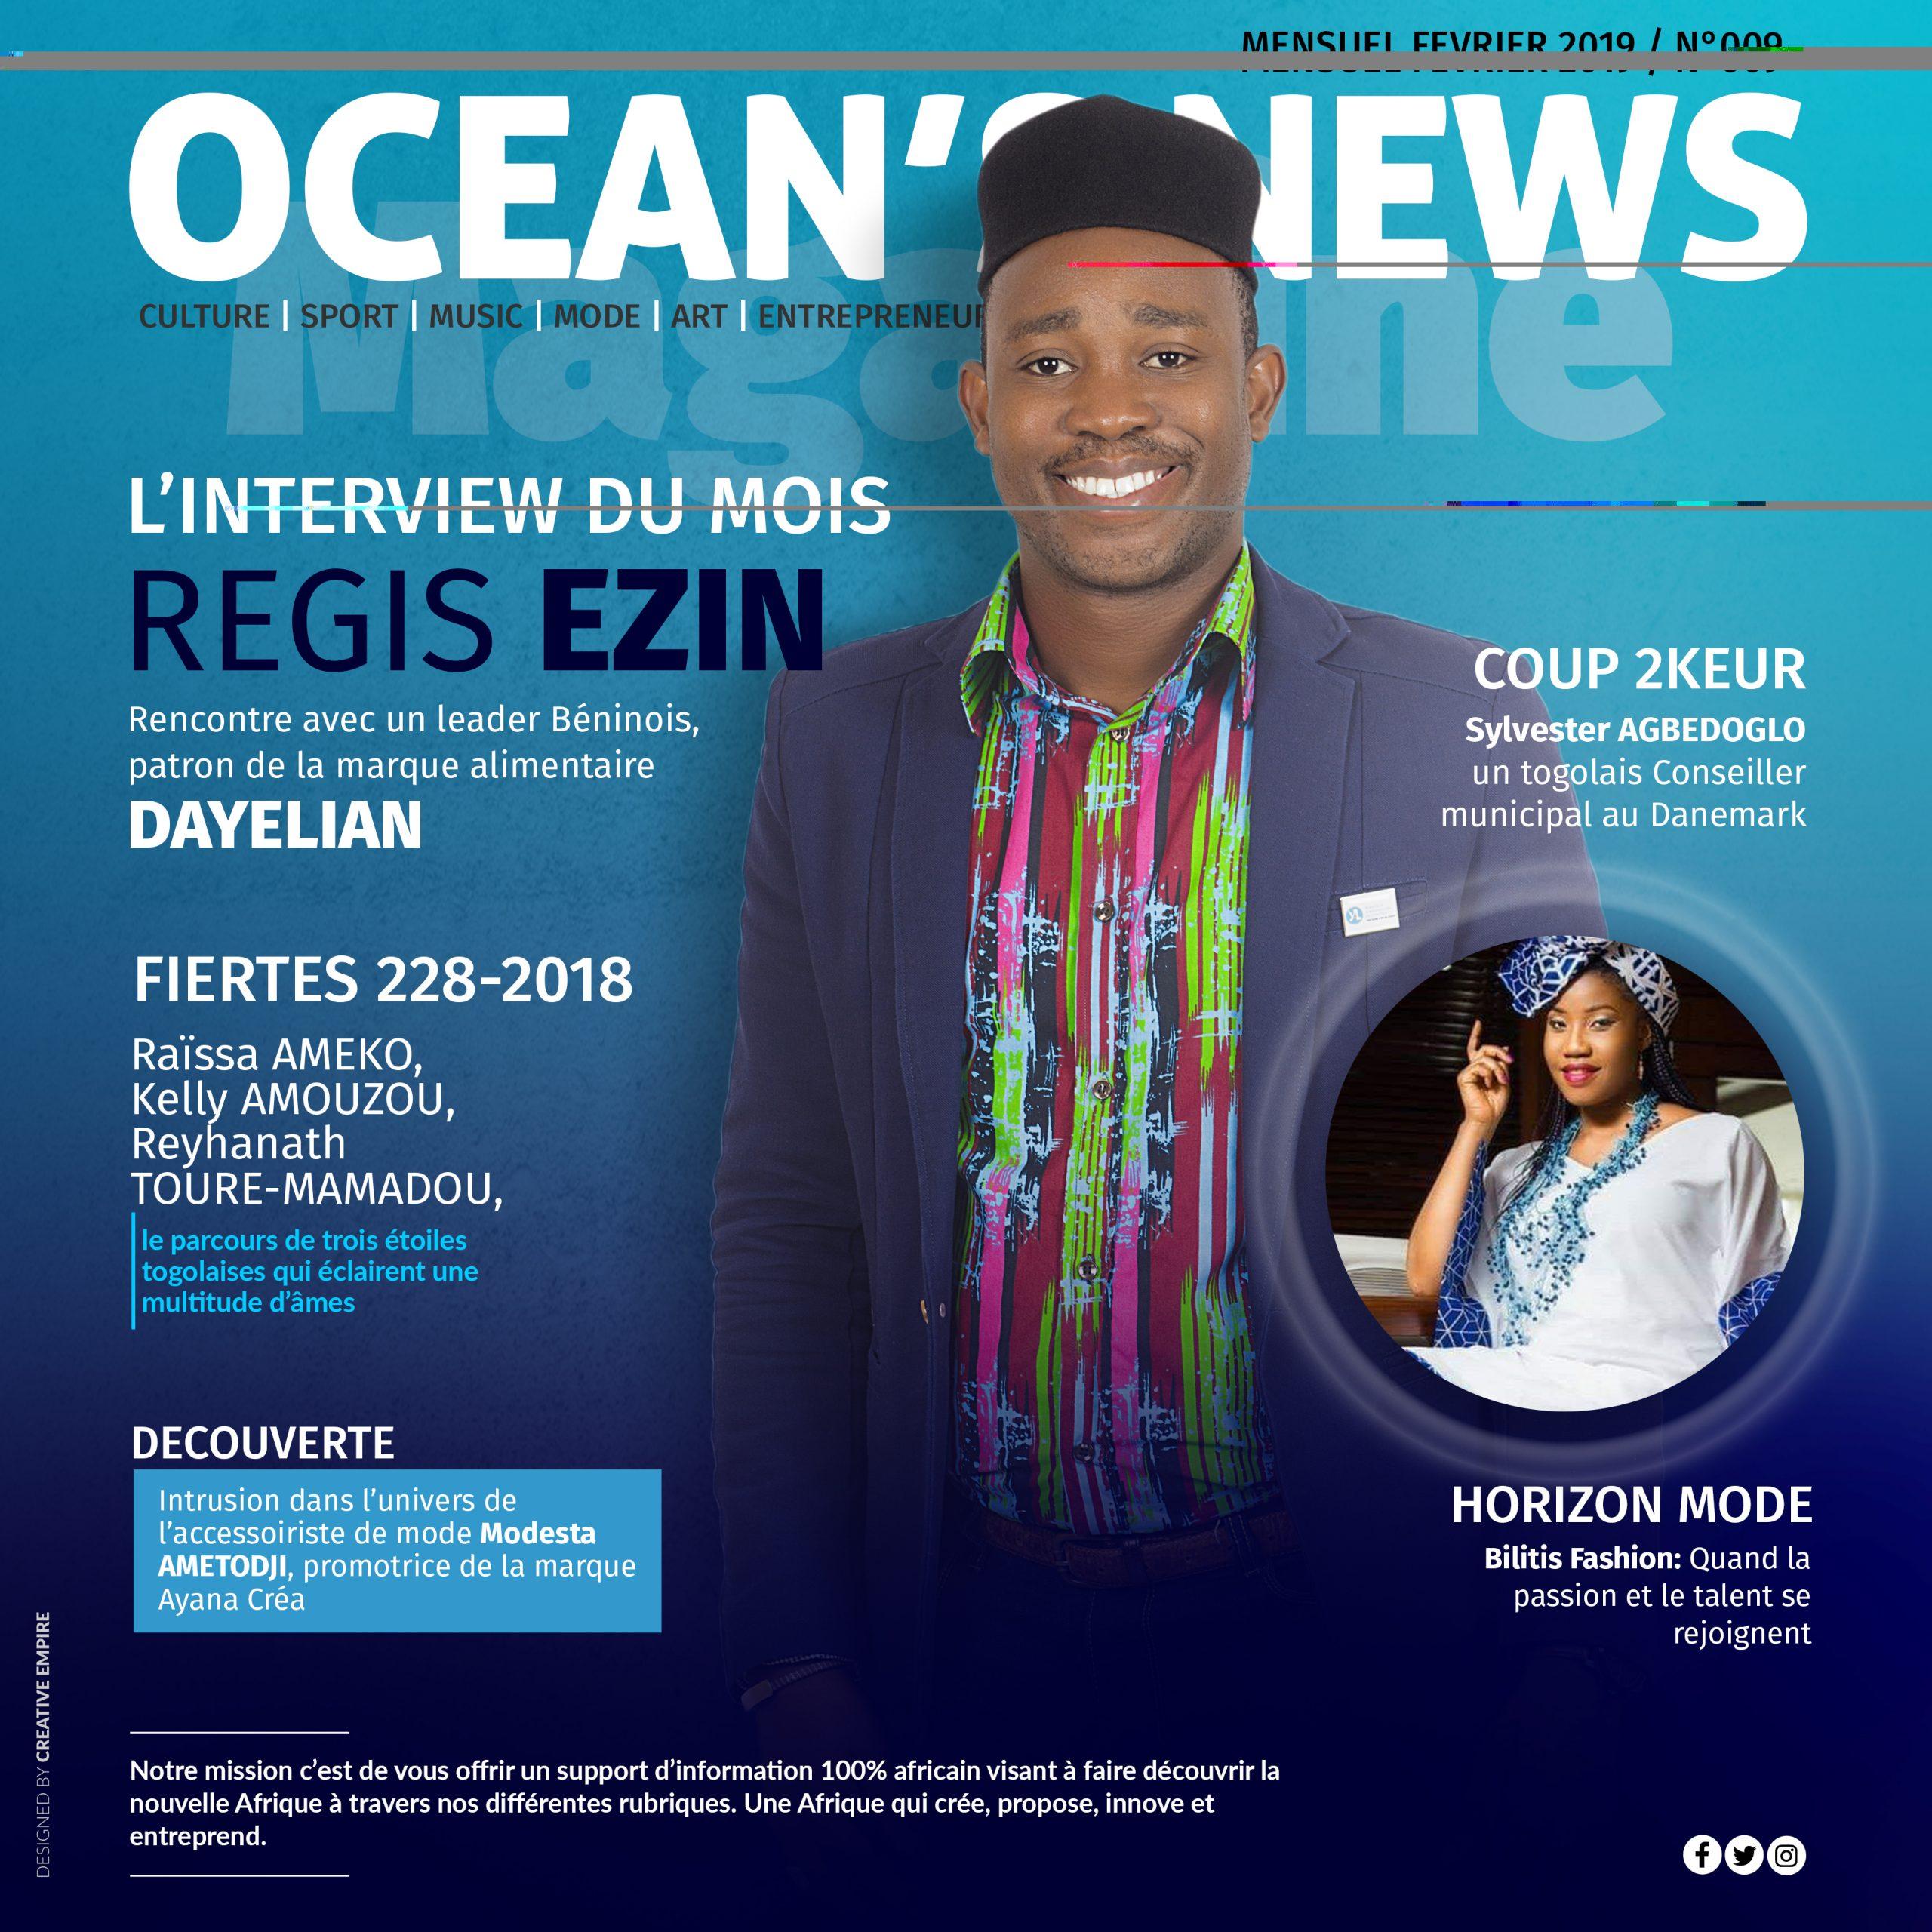 MAGAZINE OCEAN'S NEWS N°09